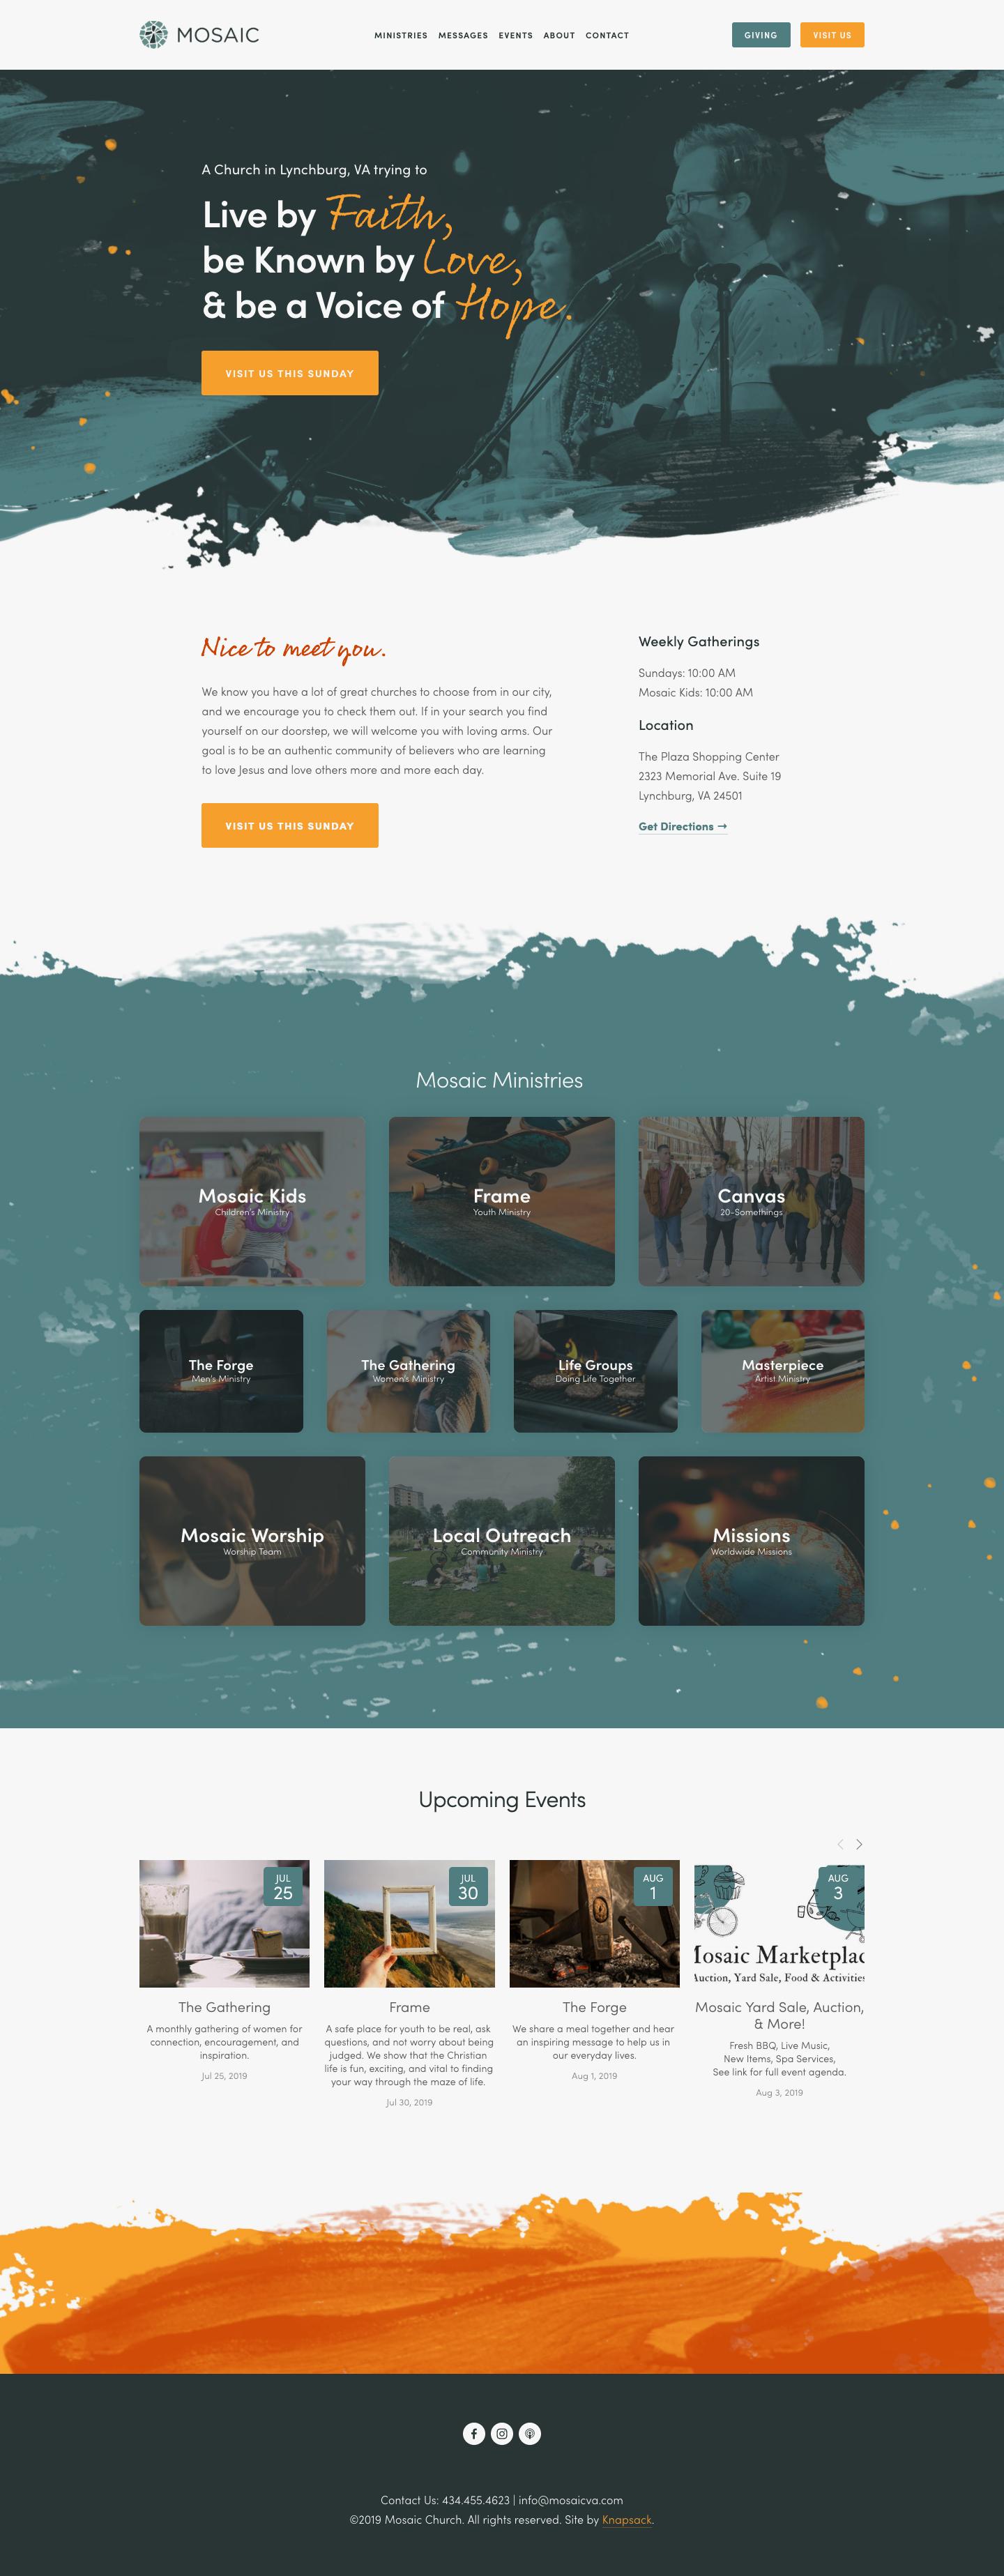 Mosaic_Homepage_Mac_overlay.png